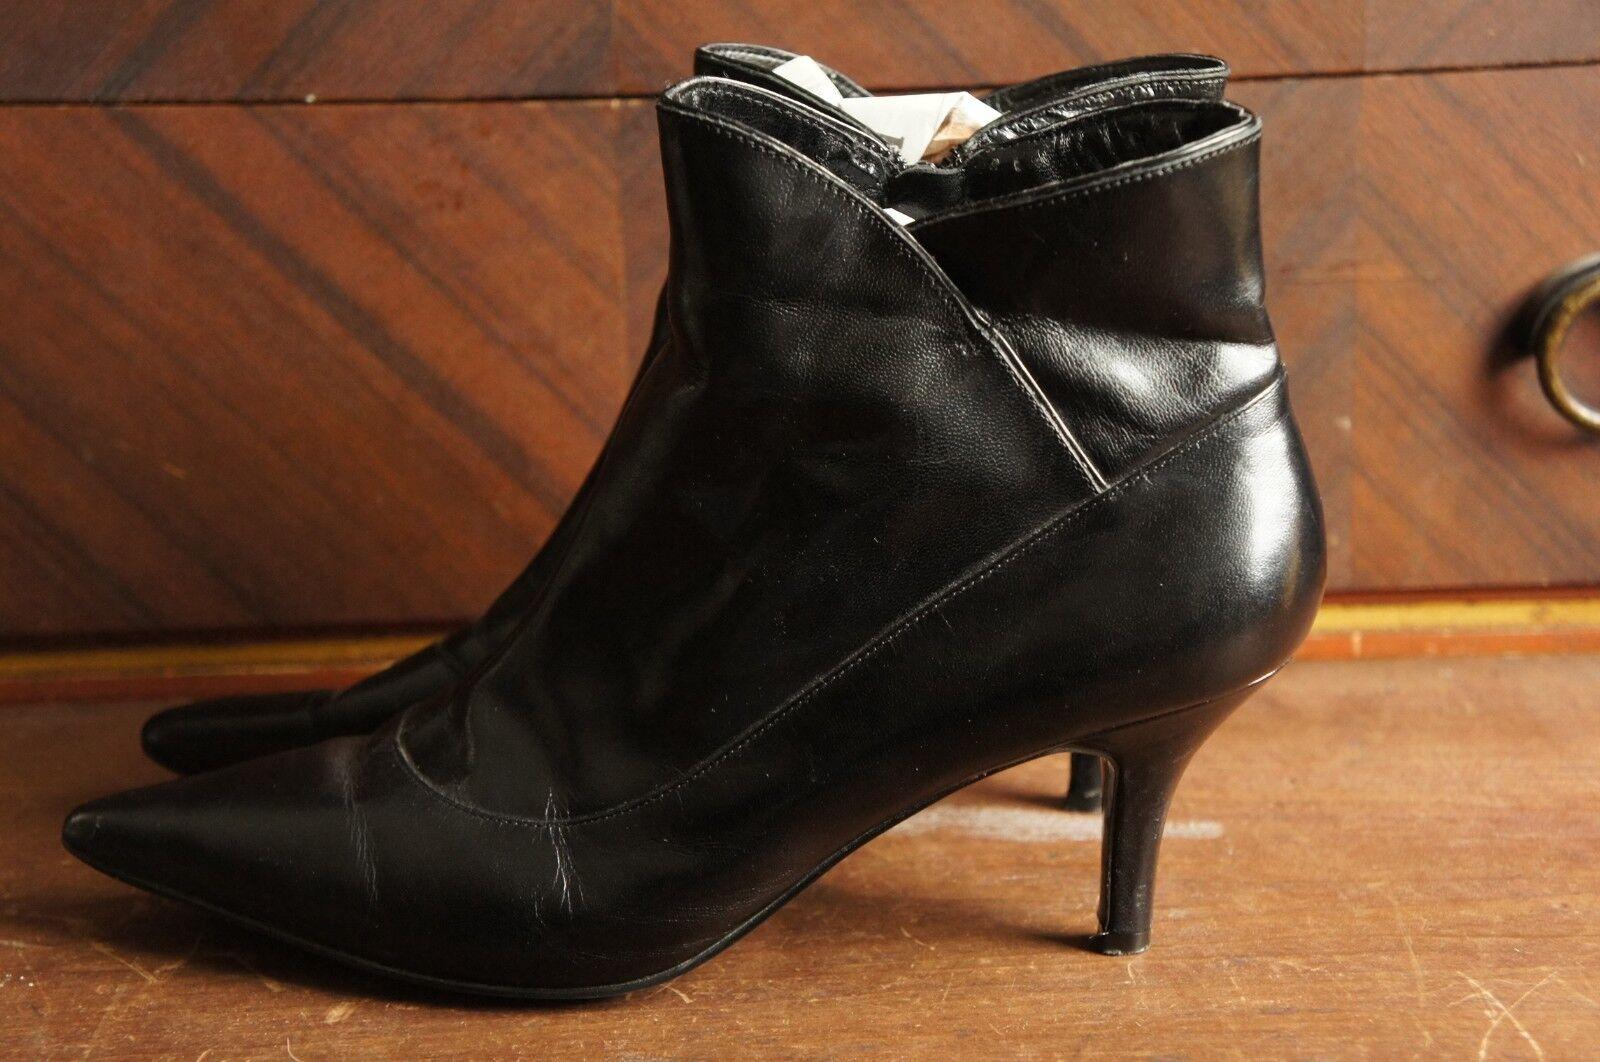 Bandolino Black Ankle Boot Heels Zipper Zip Up 7.5 M Dbalamodem Pointy Toe